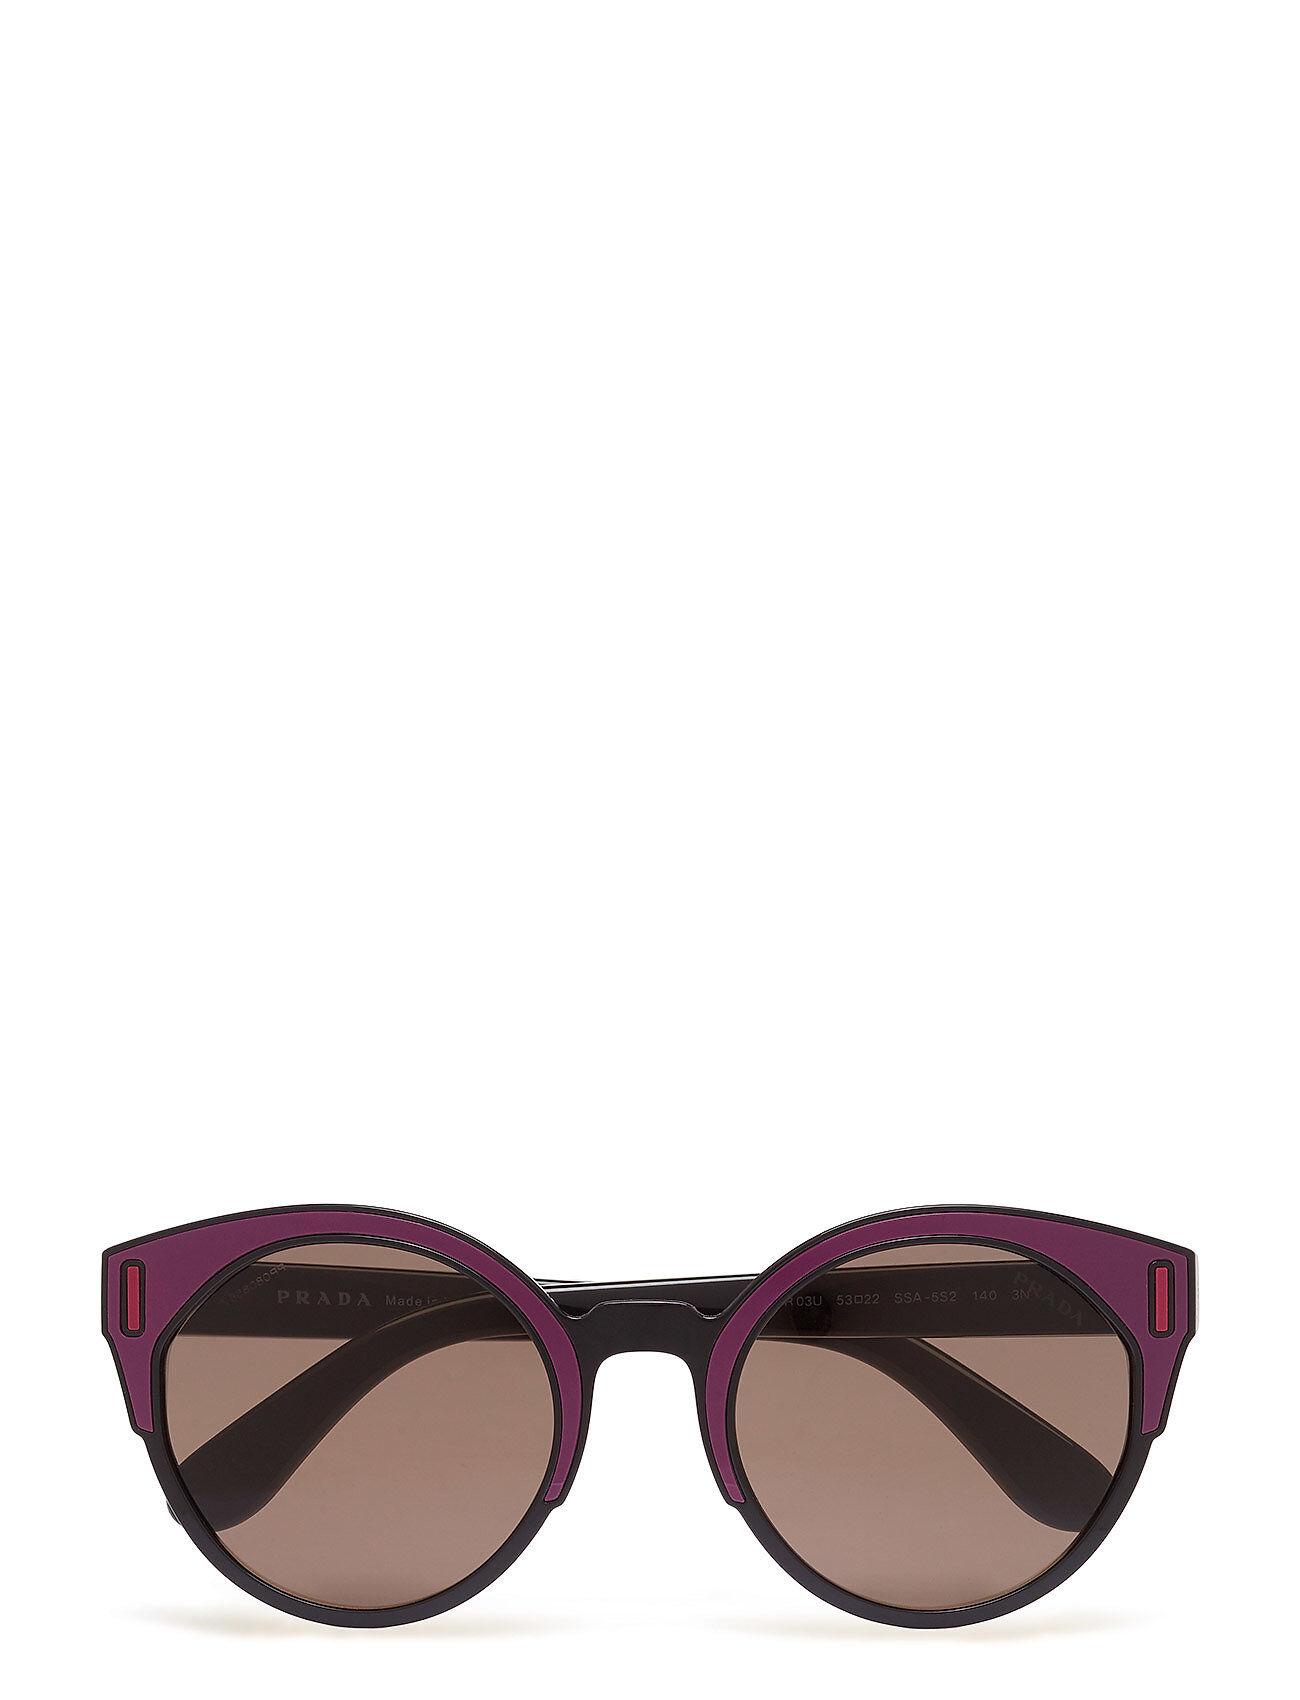 Image of Prada Sunglasses Women'S Sunglasses Aurinkolasit Liila